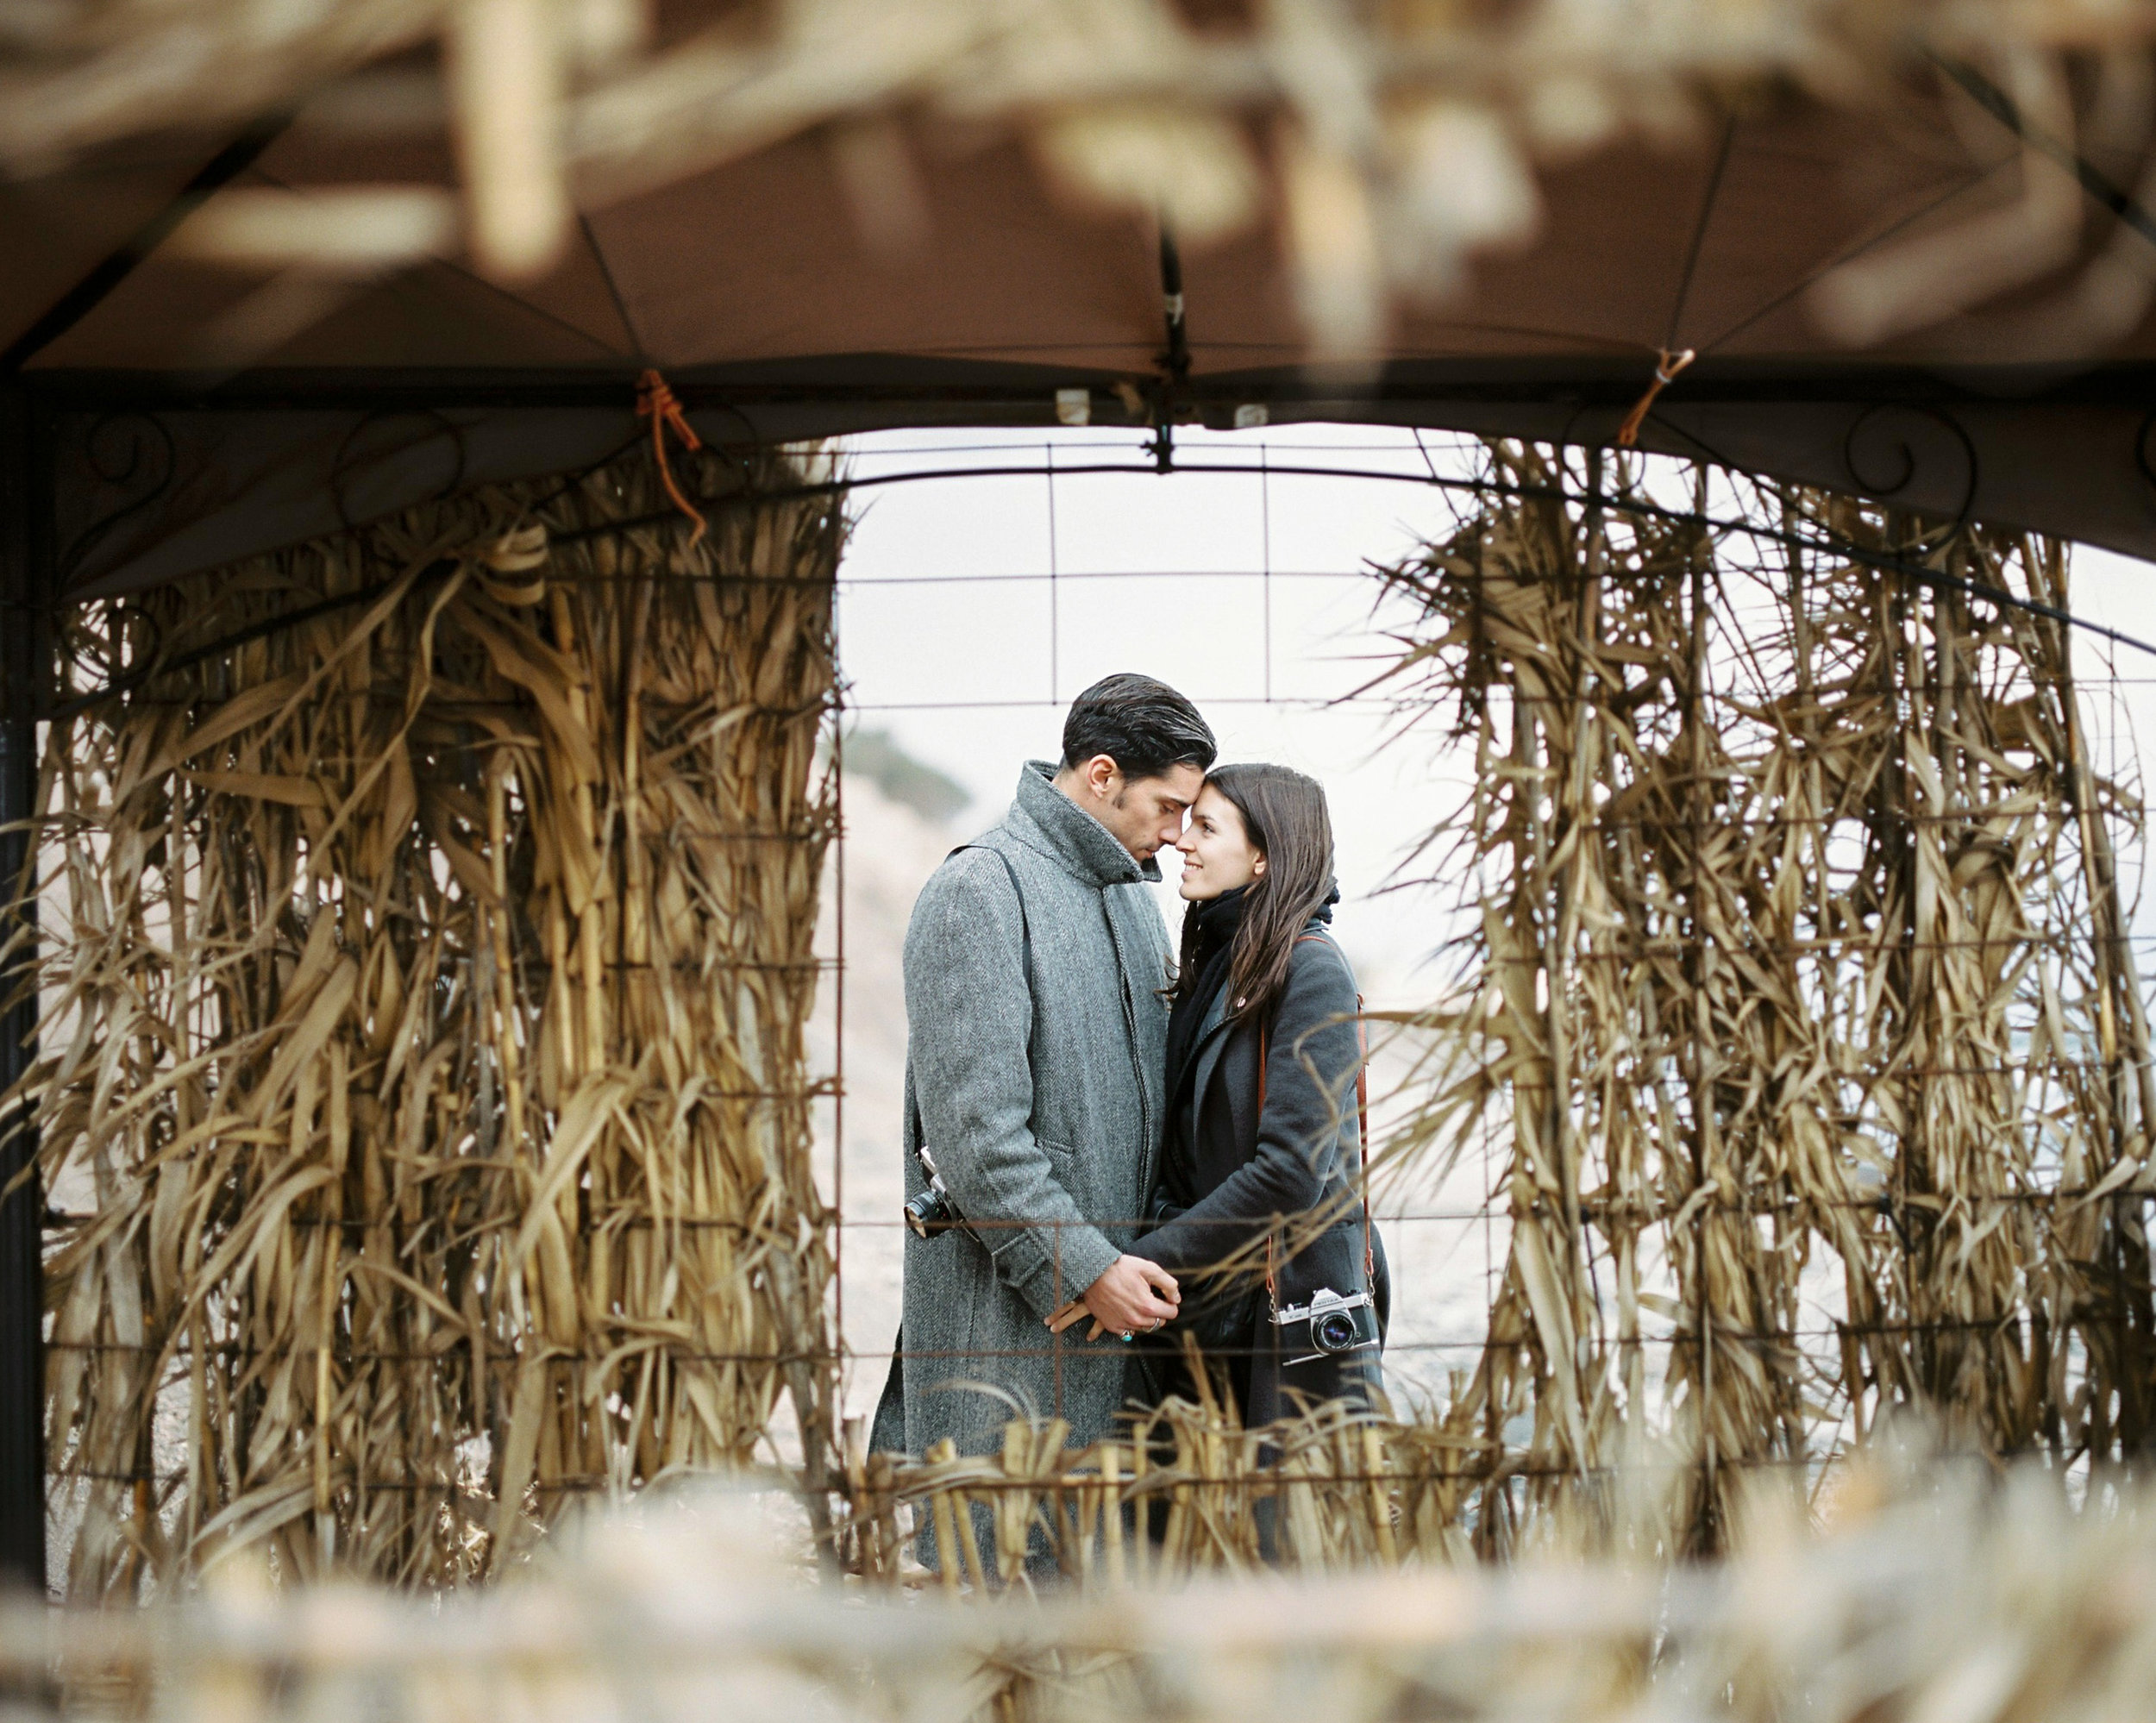 celinehamelin-photographe-couple-argentique-loversession-grece-santorin-argentique-filmphotography-greece5.jpg